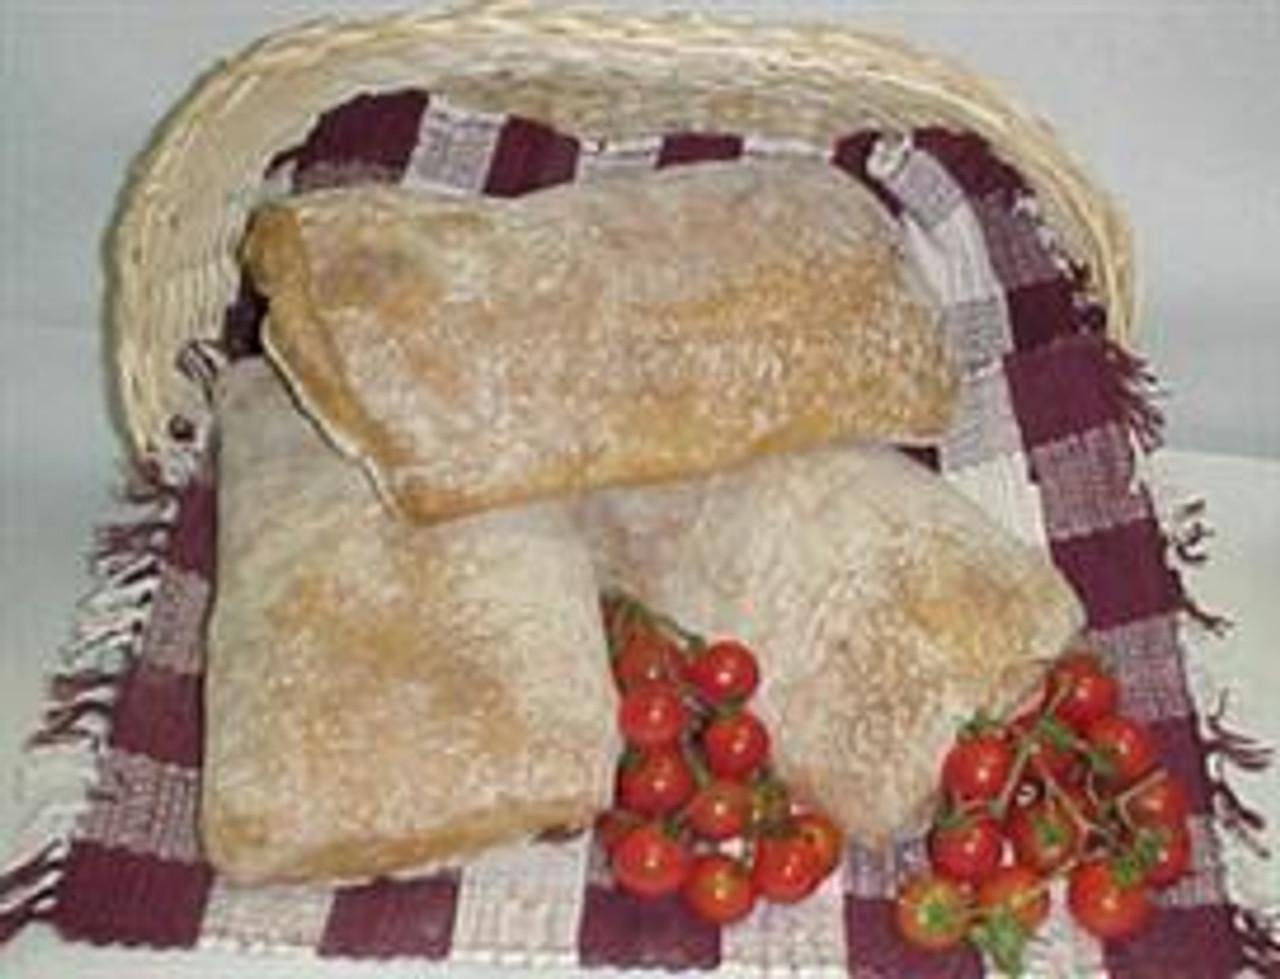 Ciabatta Rustica (made with Olive Oil)